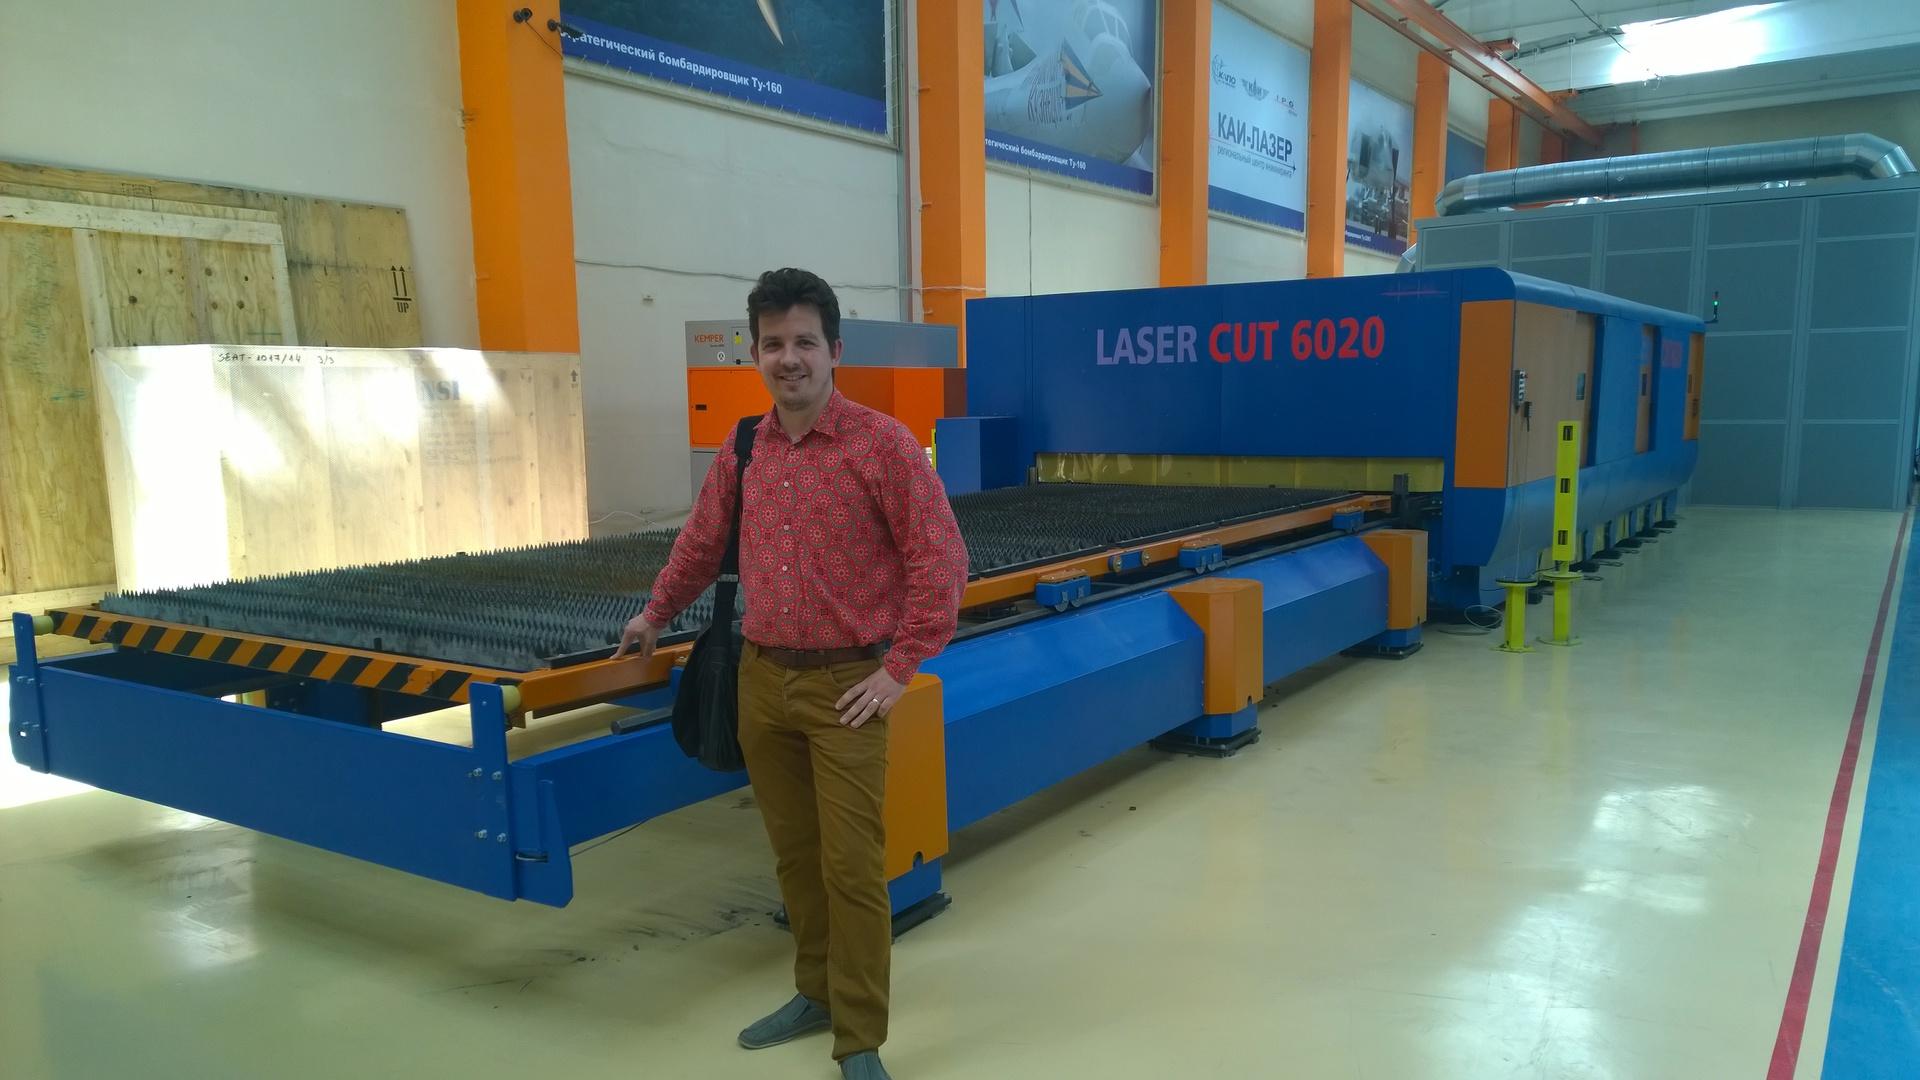 Как мы ходили на экскурсию к «КАИ Лазер»